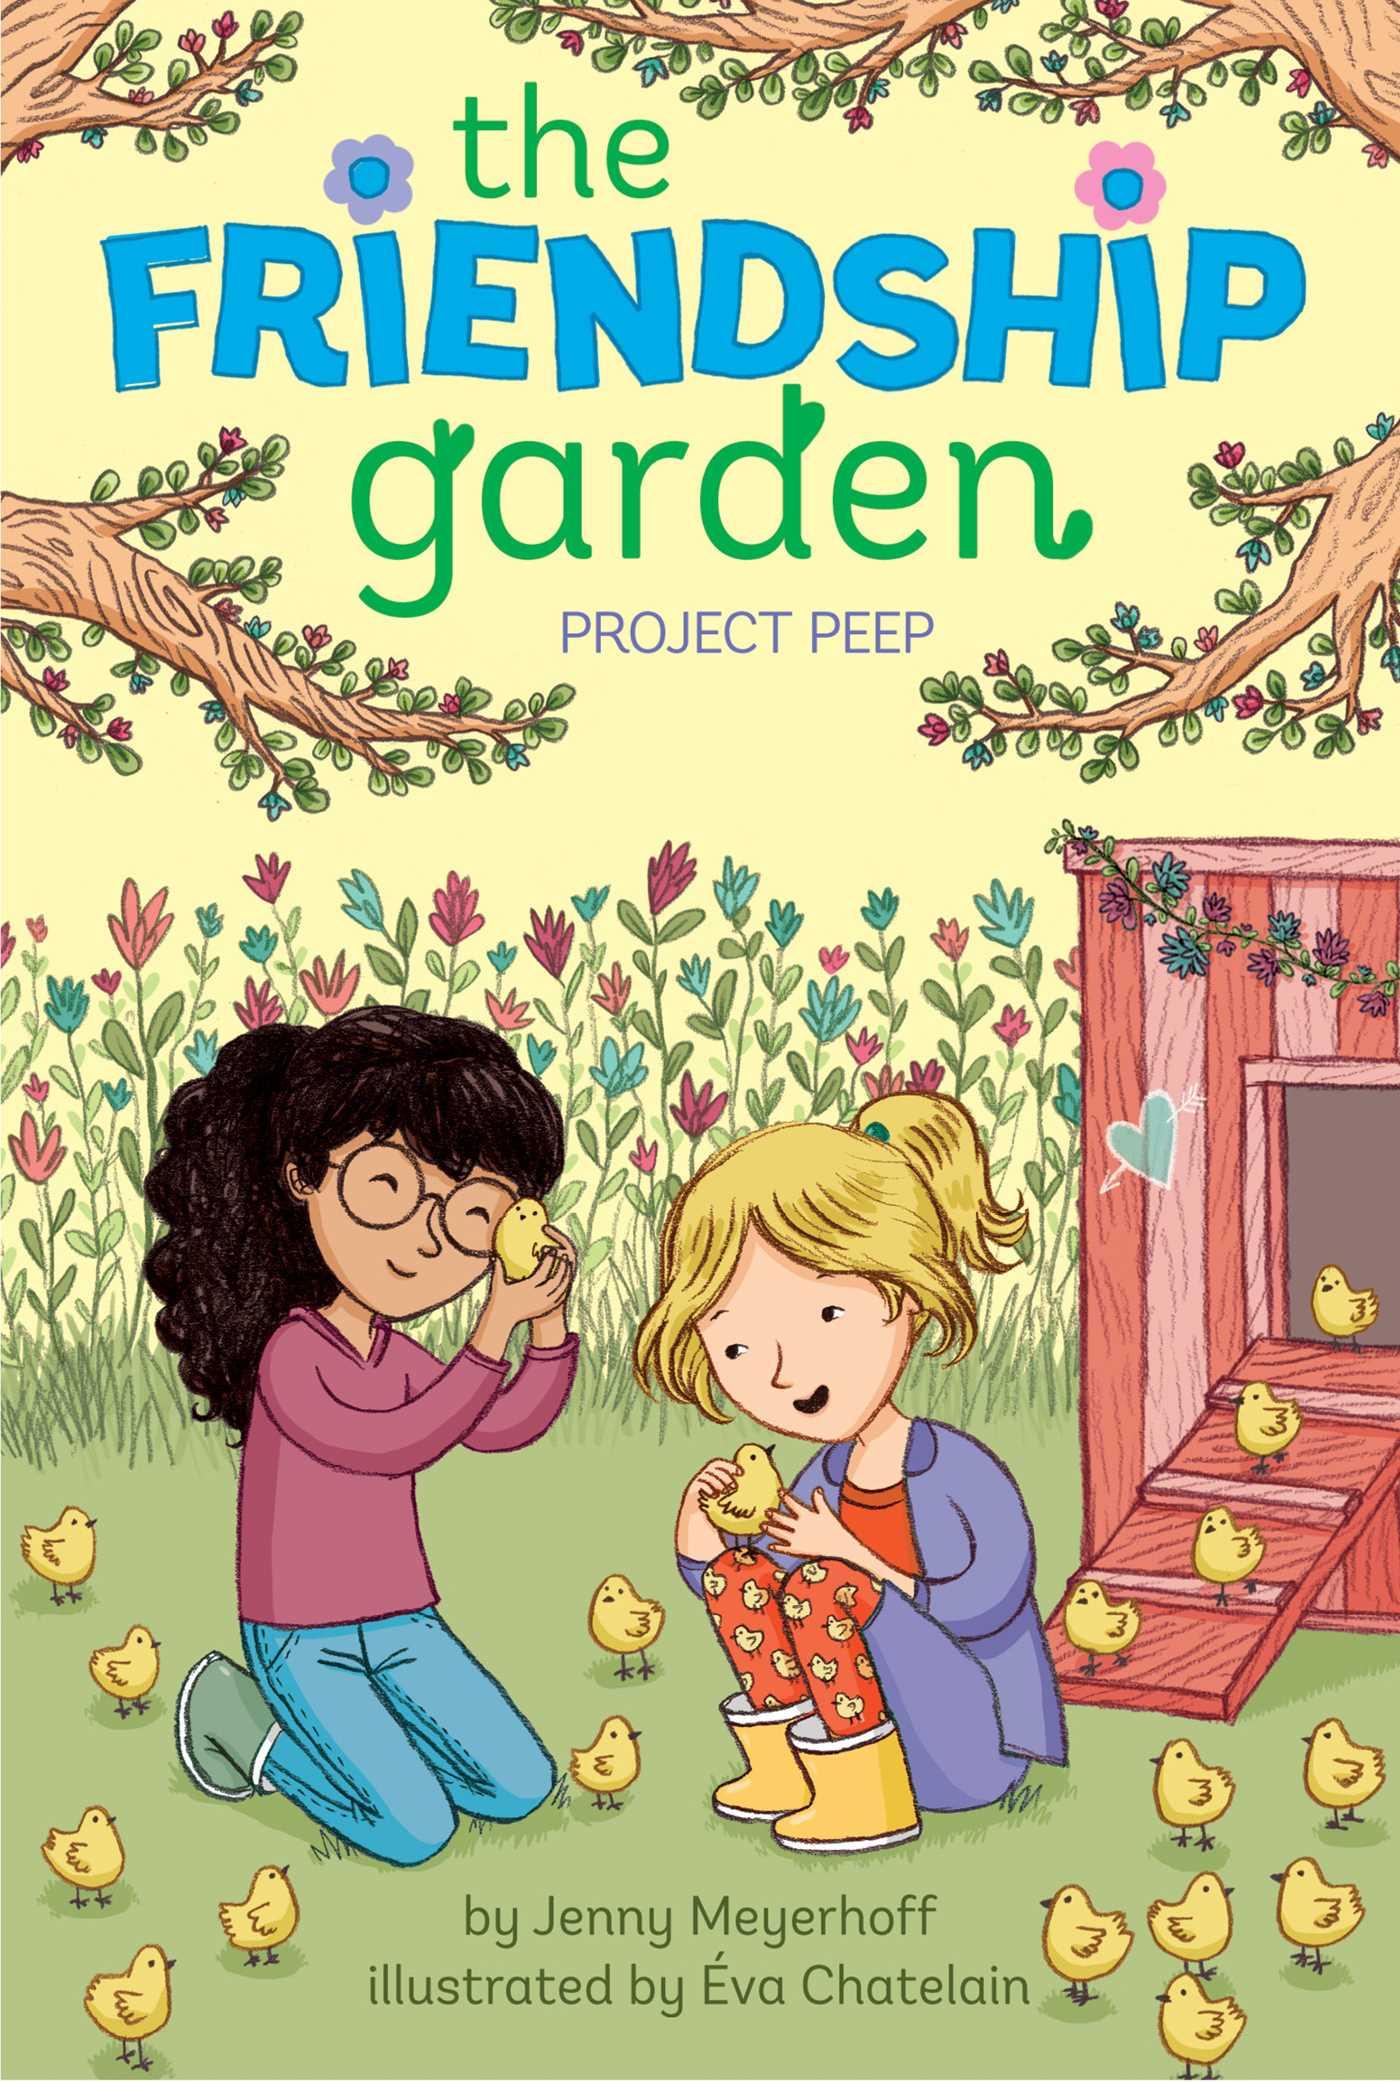 Project Peep Book By Jenny Meyerhoff 201 Va Chatelain